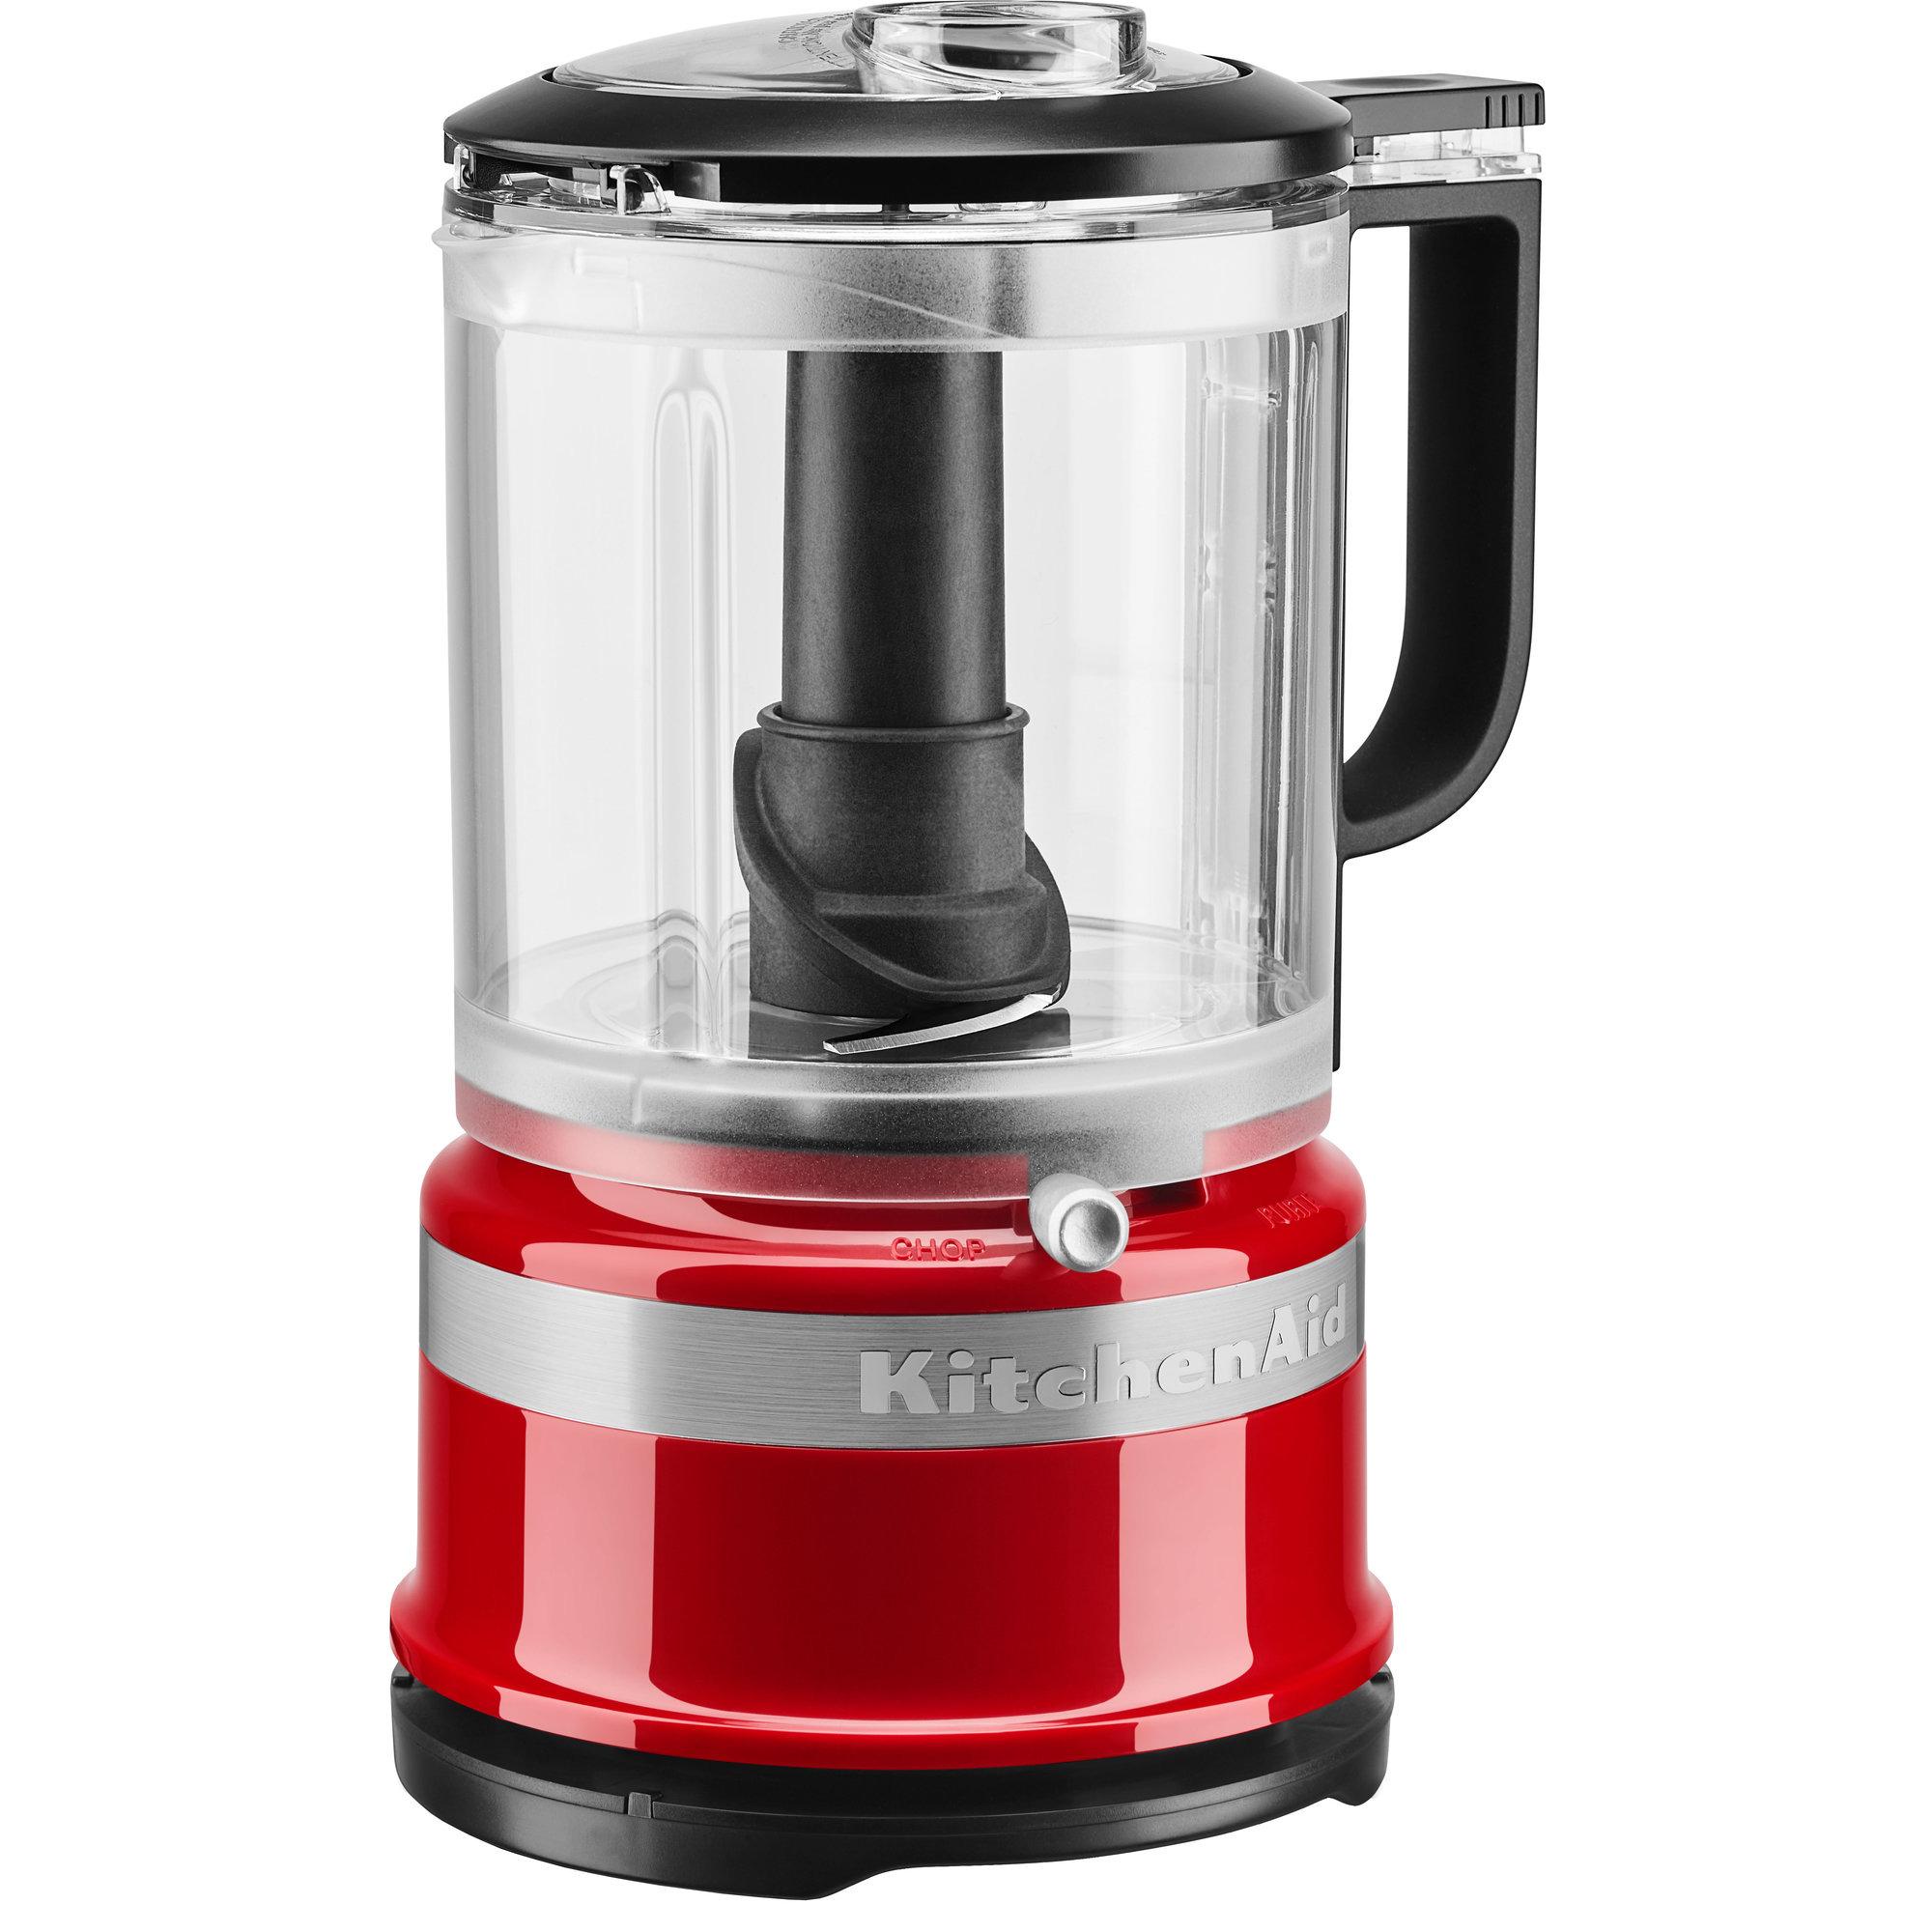 KitchenAid 5KFC0516 119 Liter Mini matberedare Röd